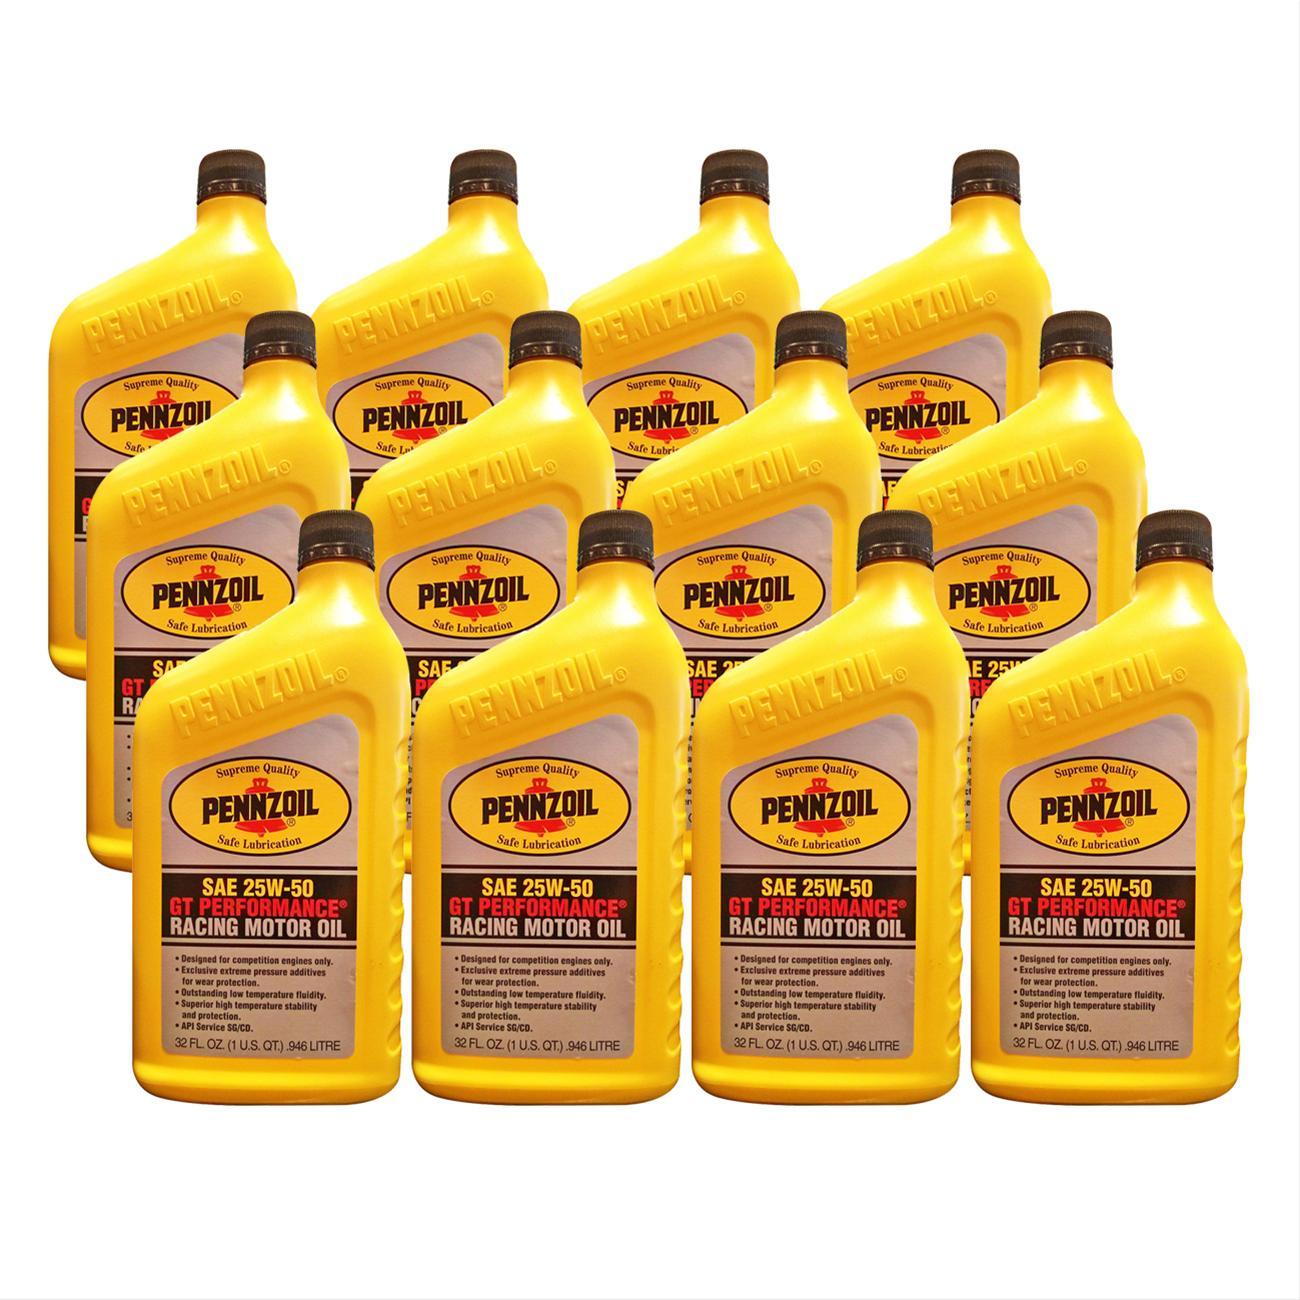 Pennzoil Motor Oil Pennzoil Conventional 25w50 1 Quart Set